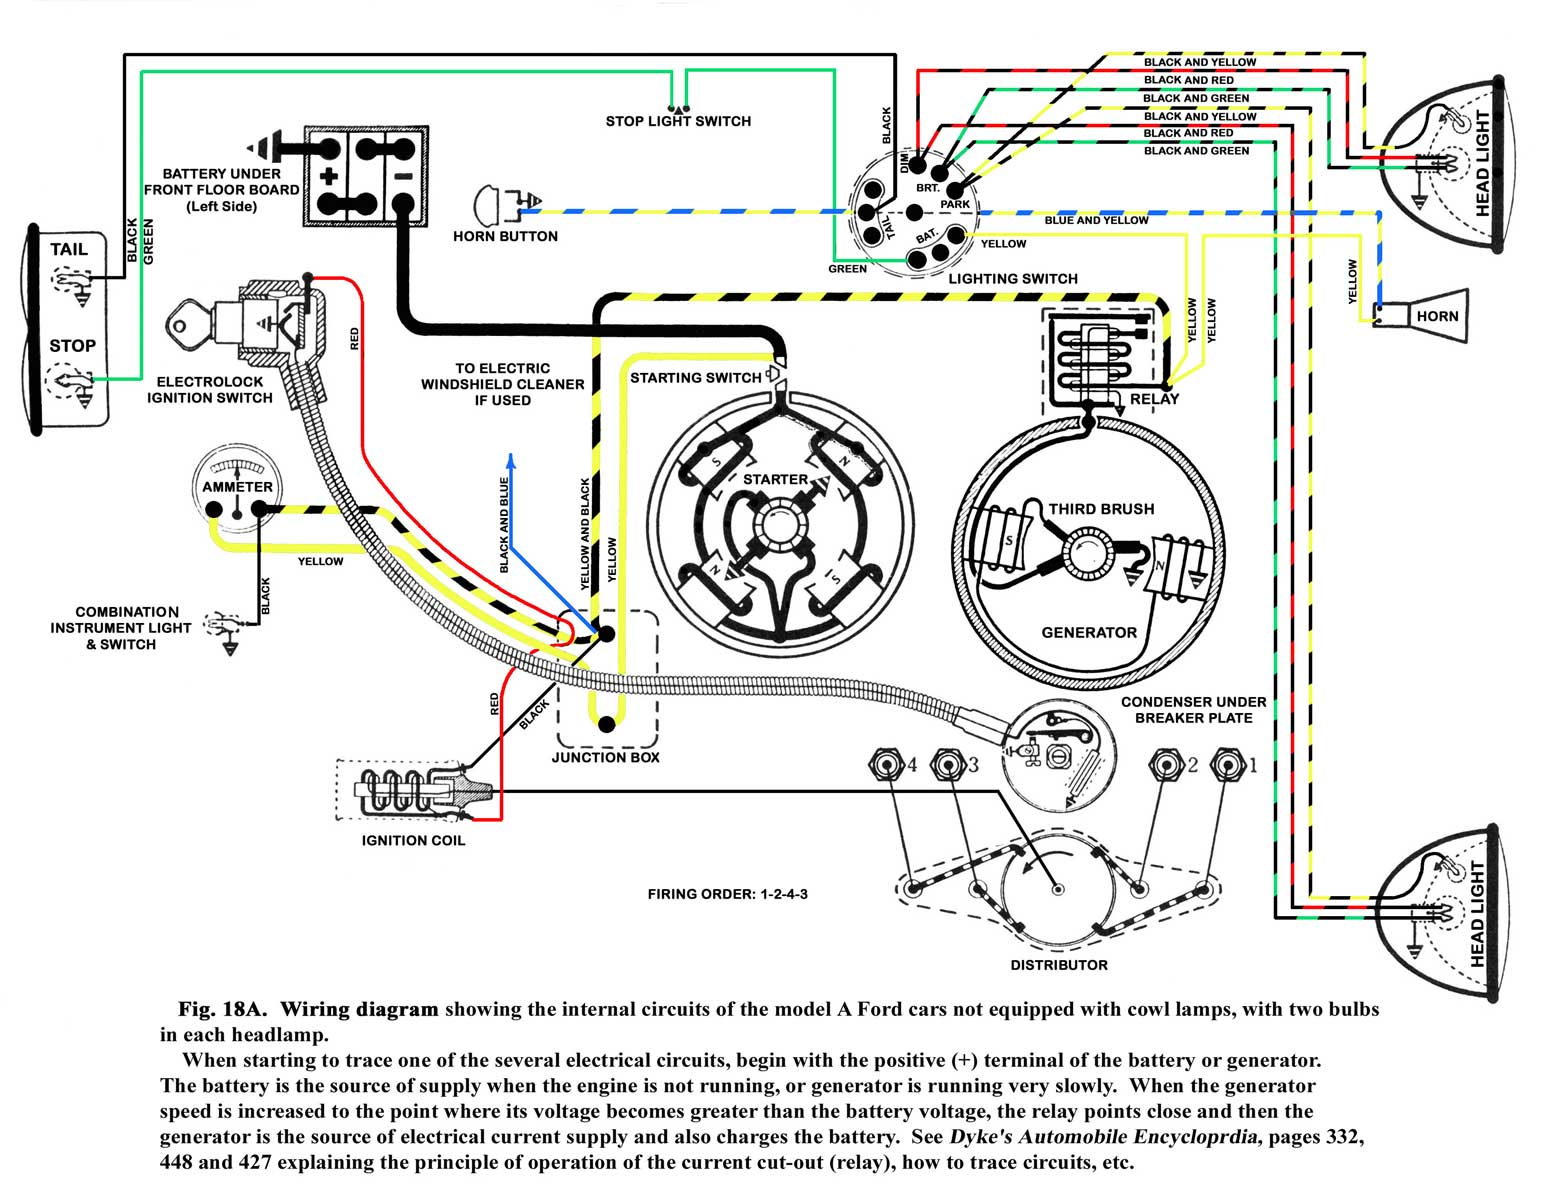 small resolution of 12 volt generator wiring diagram wwwallischalmerscom forum ford tractor ignition switch wiring http wwwpic2flycom ford